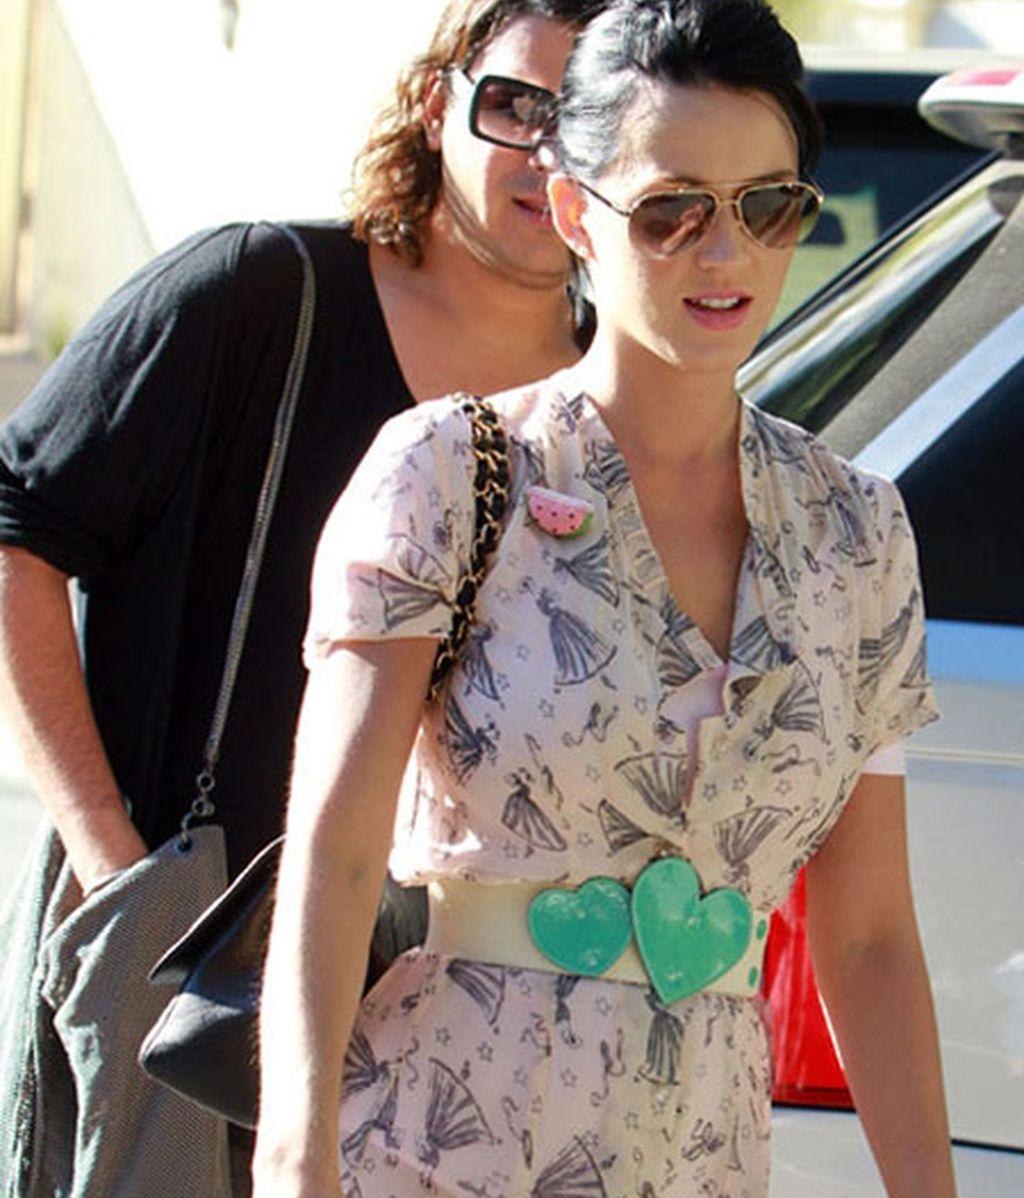 Nueva pareja: Katy Perry y Rusell Brand